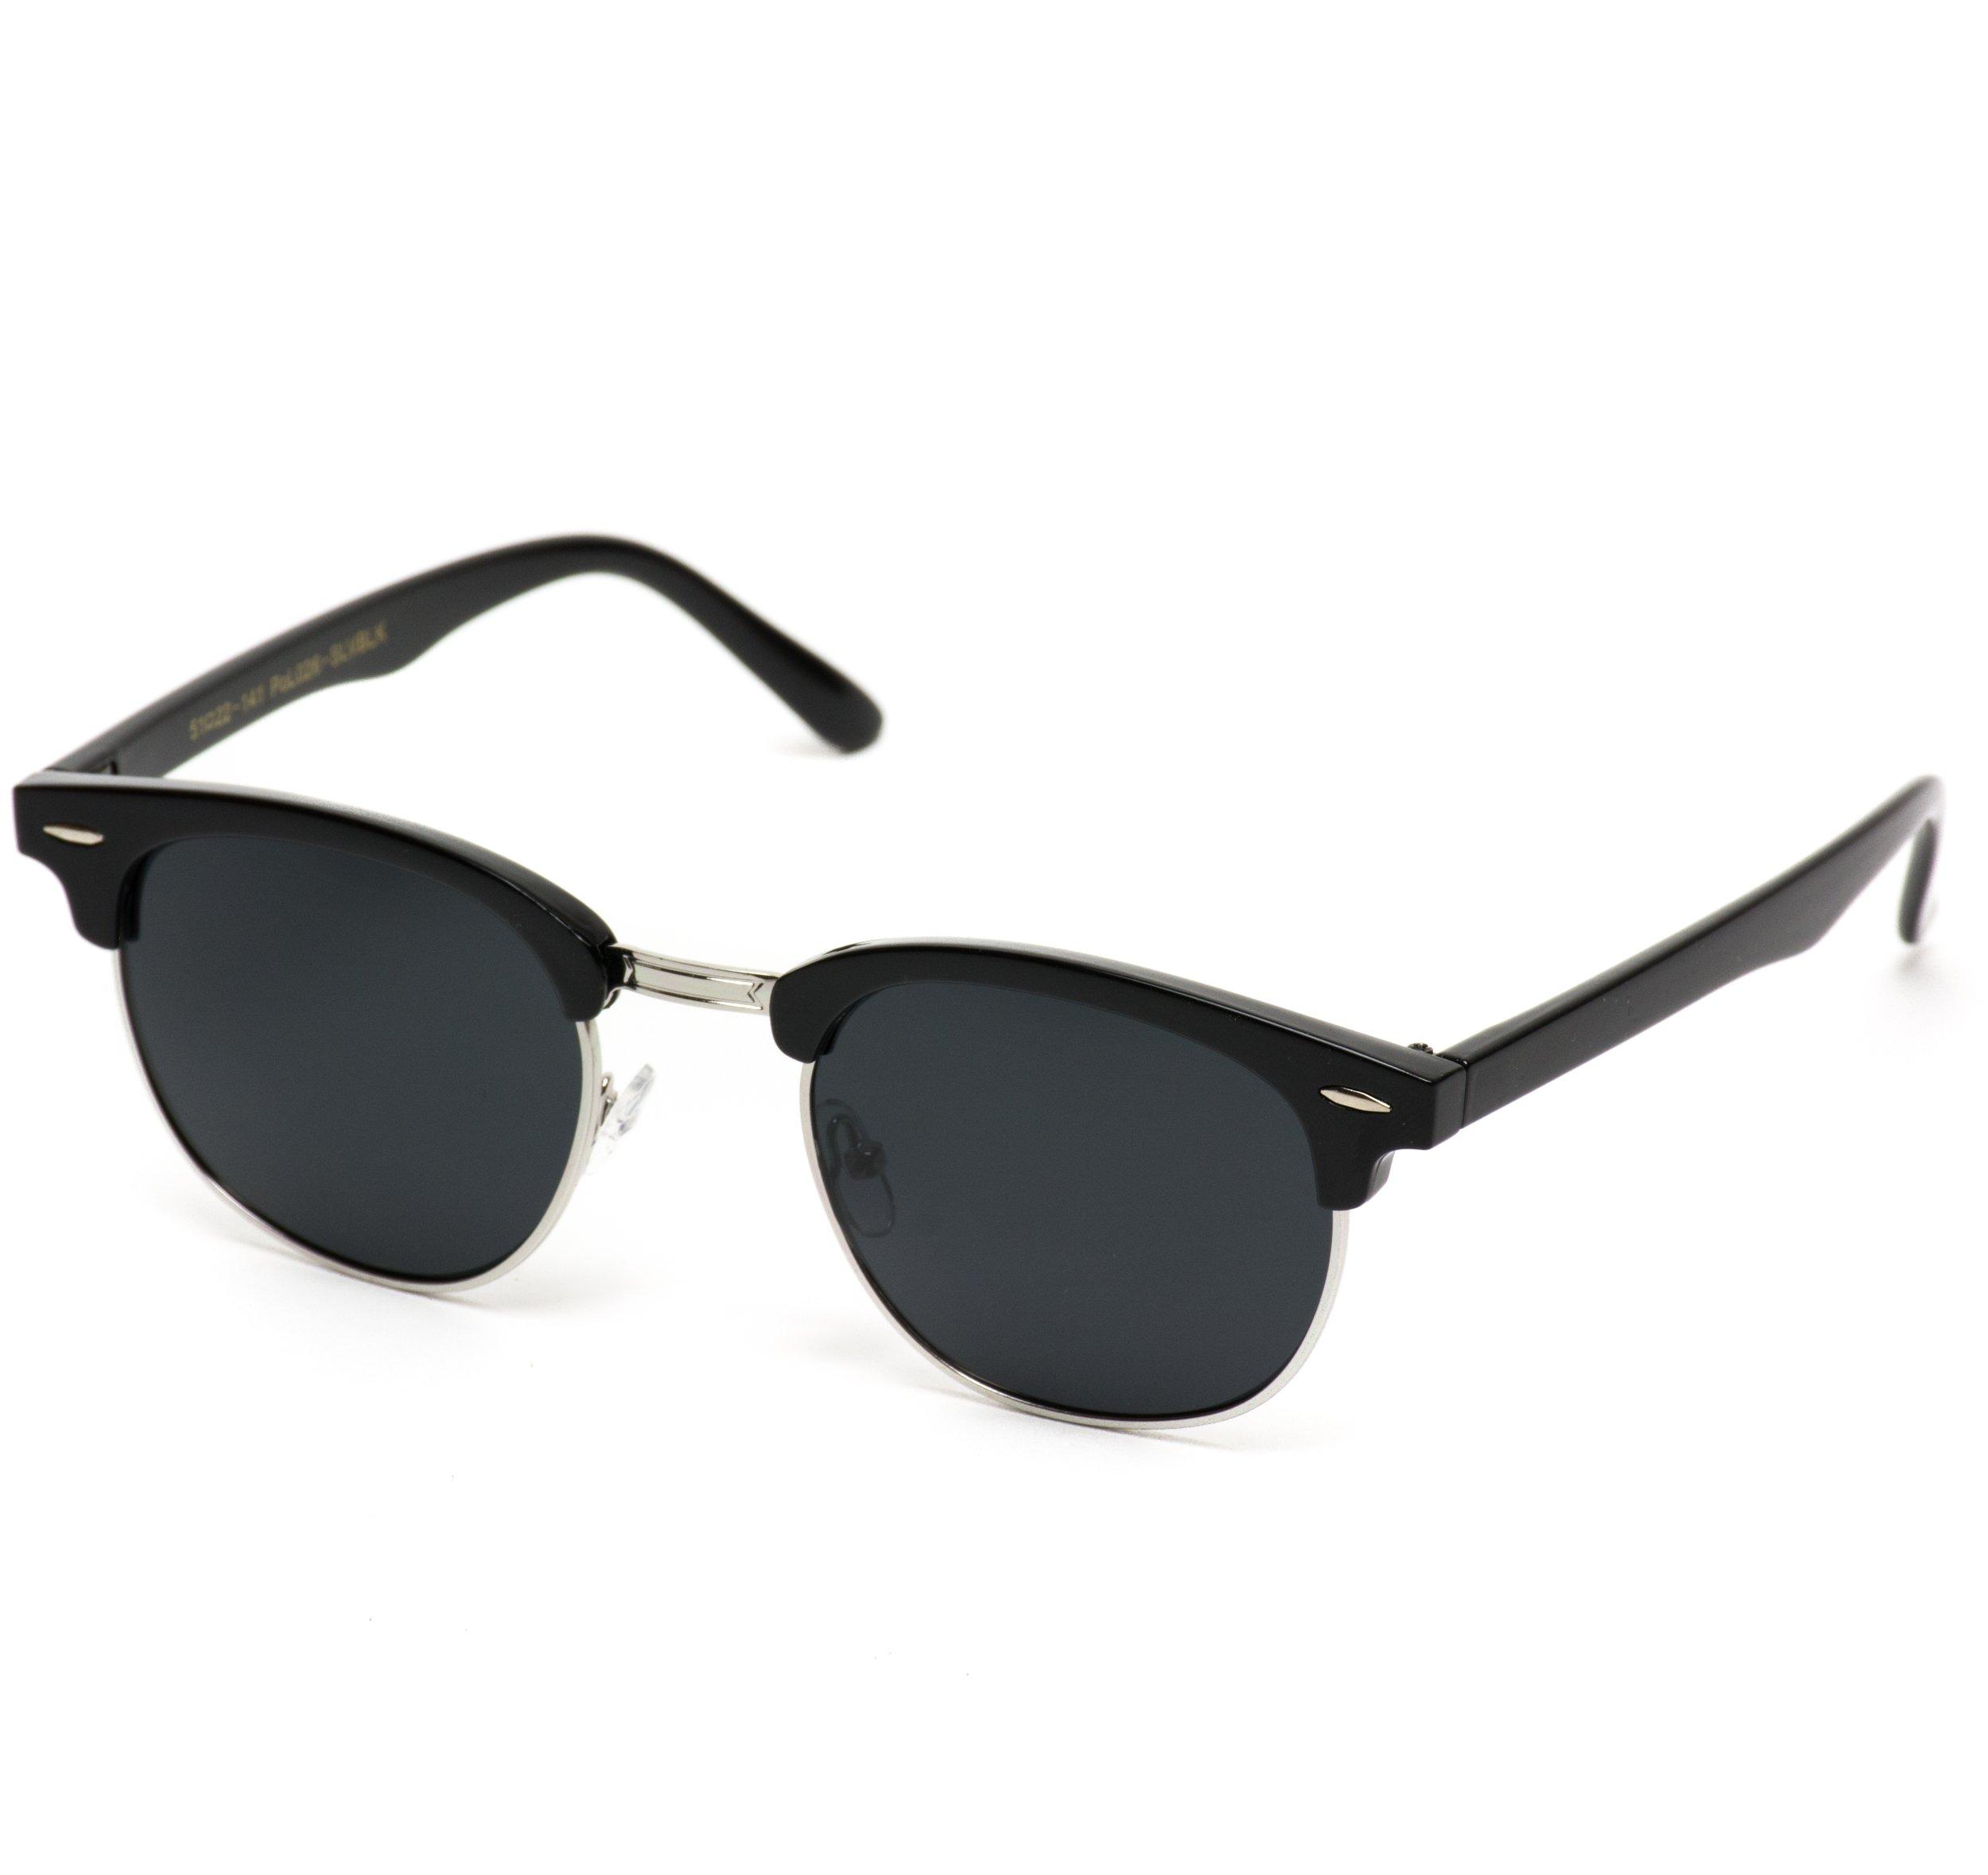 b43fcff2c8 WearMe Pro - Classic Half Frame Polarized Semi-Rimless Rimmed Sunglasses    Departments   Clothing